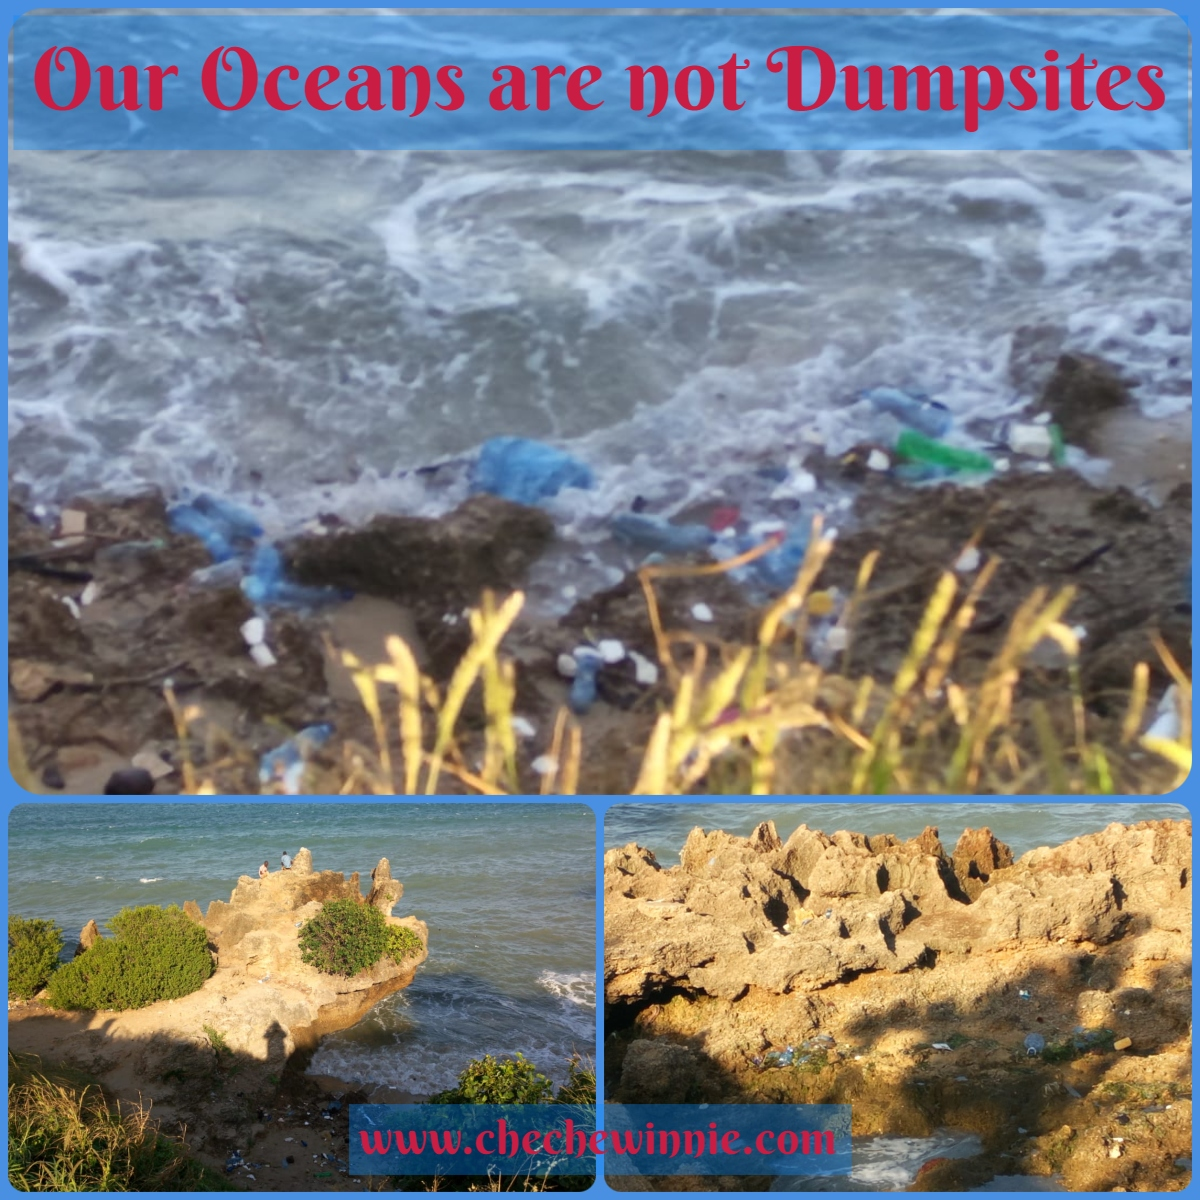 Our Oceans are not Dumpsites